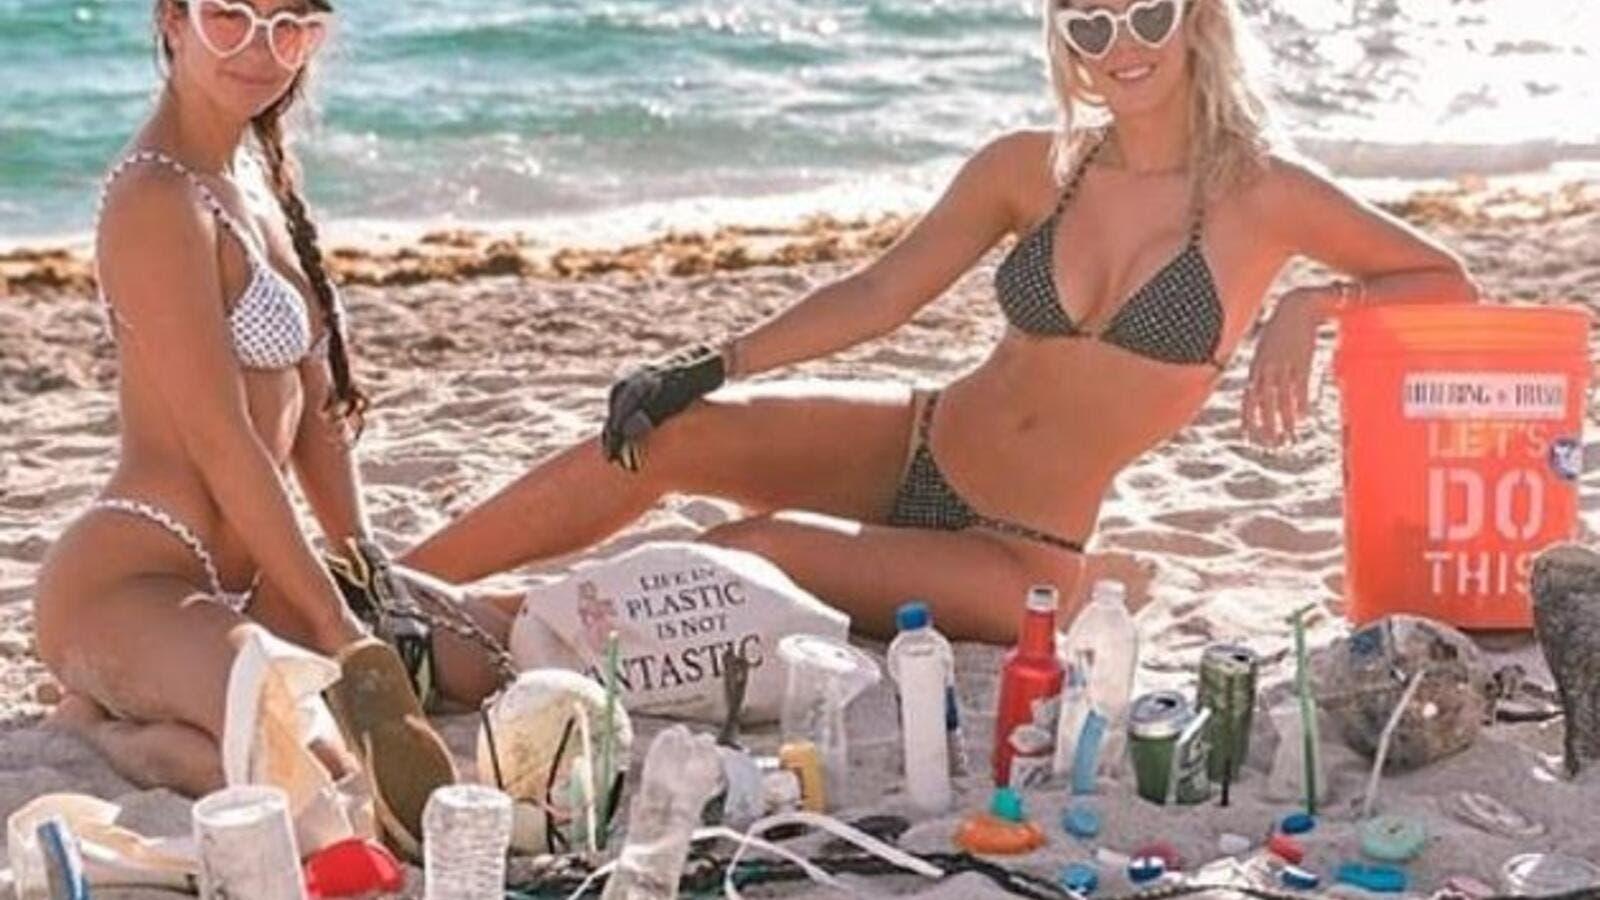 9885c38fbc1 Cleaning up Beach in a Bikini Sends Powerful Message! | Al Bawaba